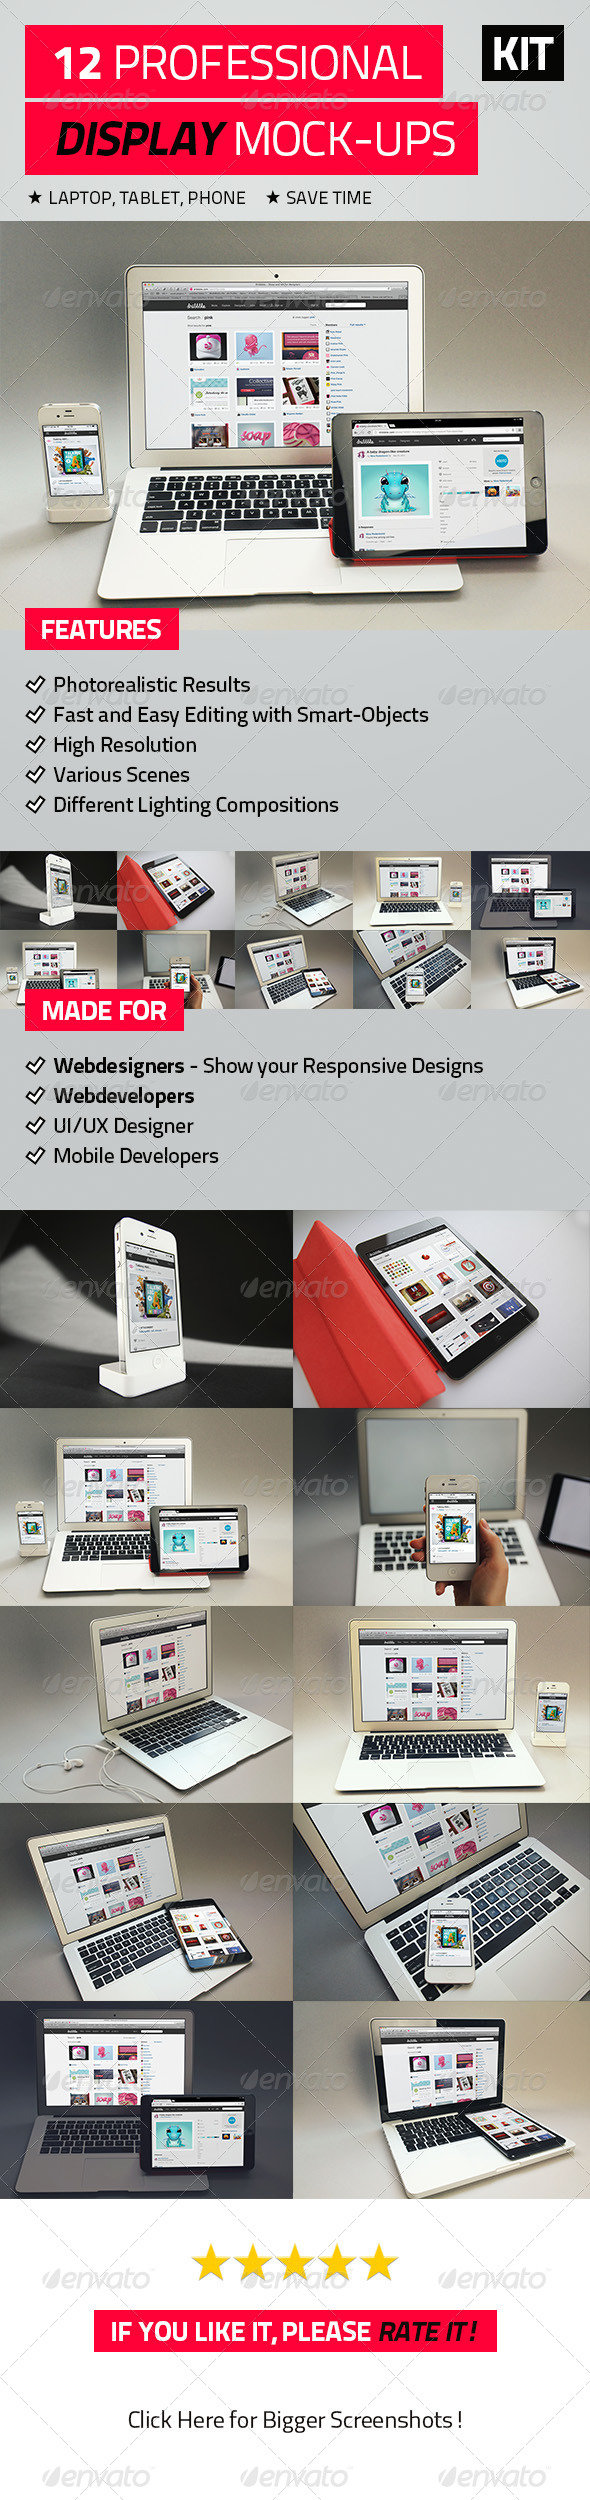 12 Professional Display Mock-Ups - Product Mock-Ups Graphics